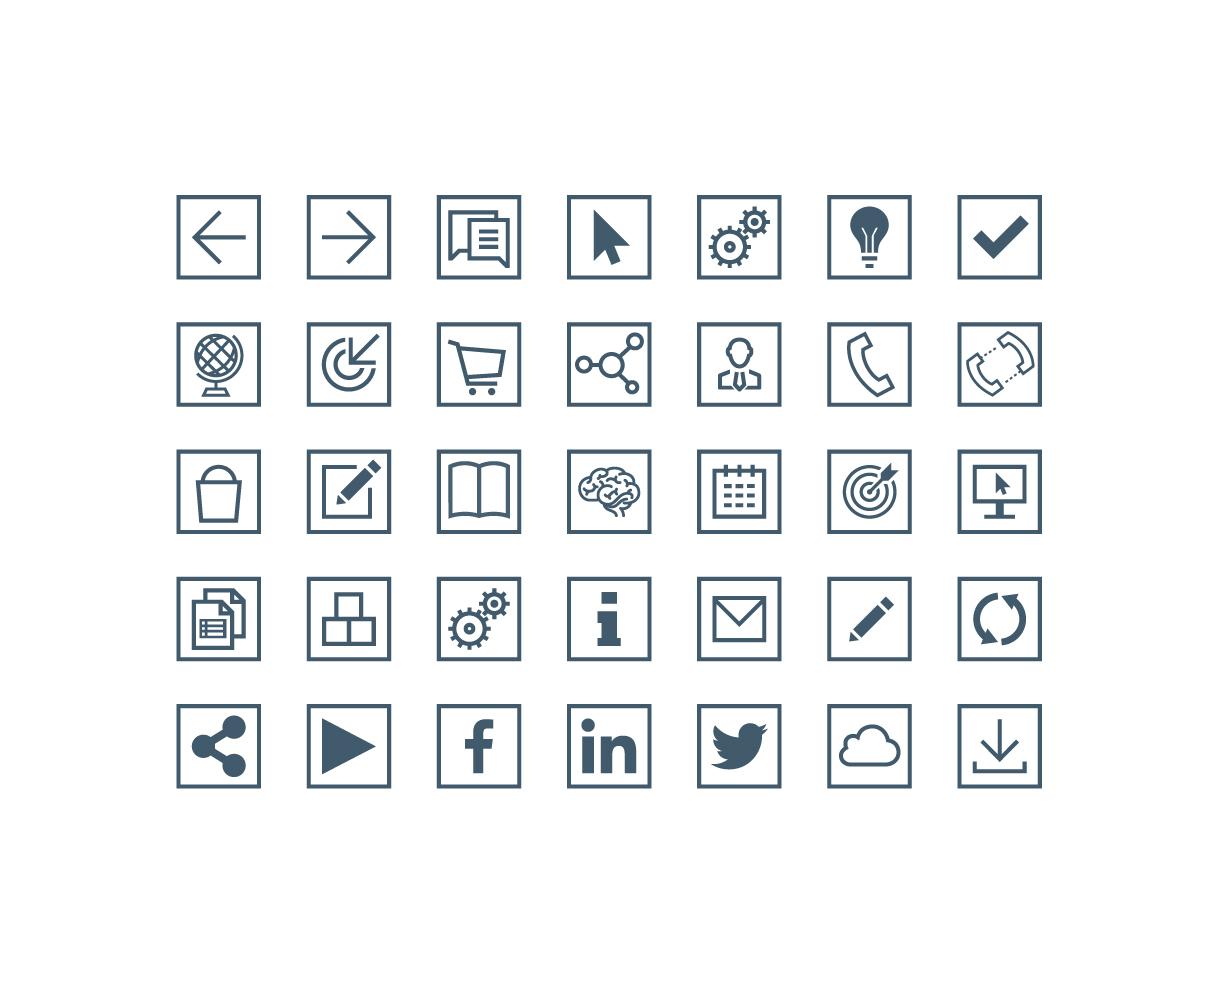 Sureskills Brand Identity Development Icons